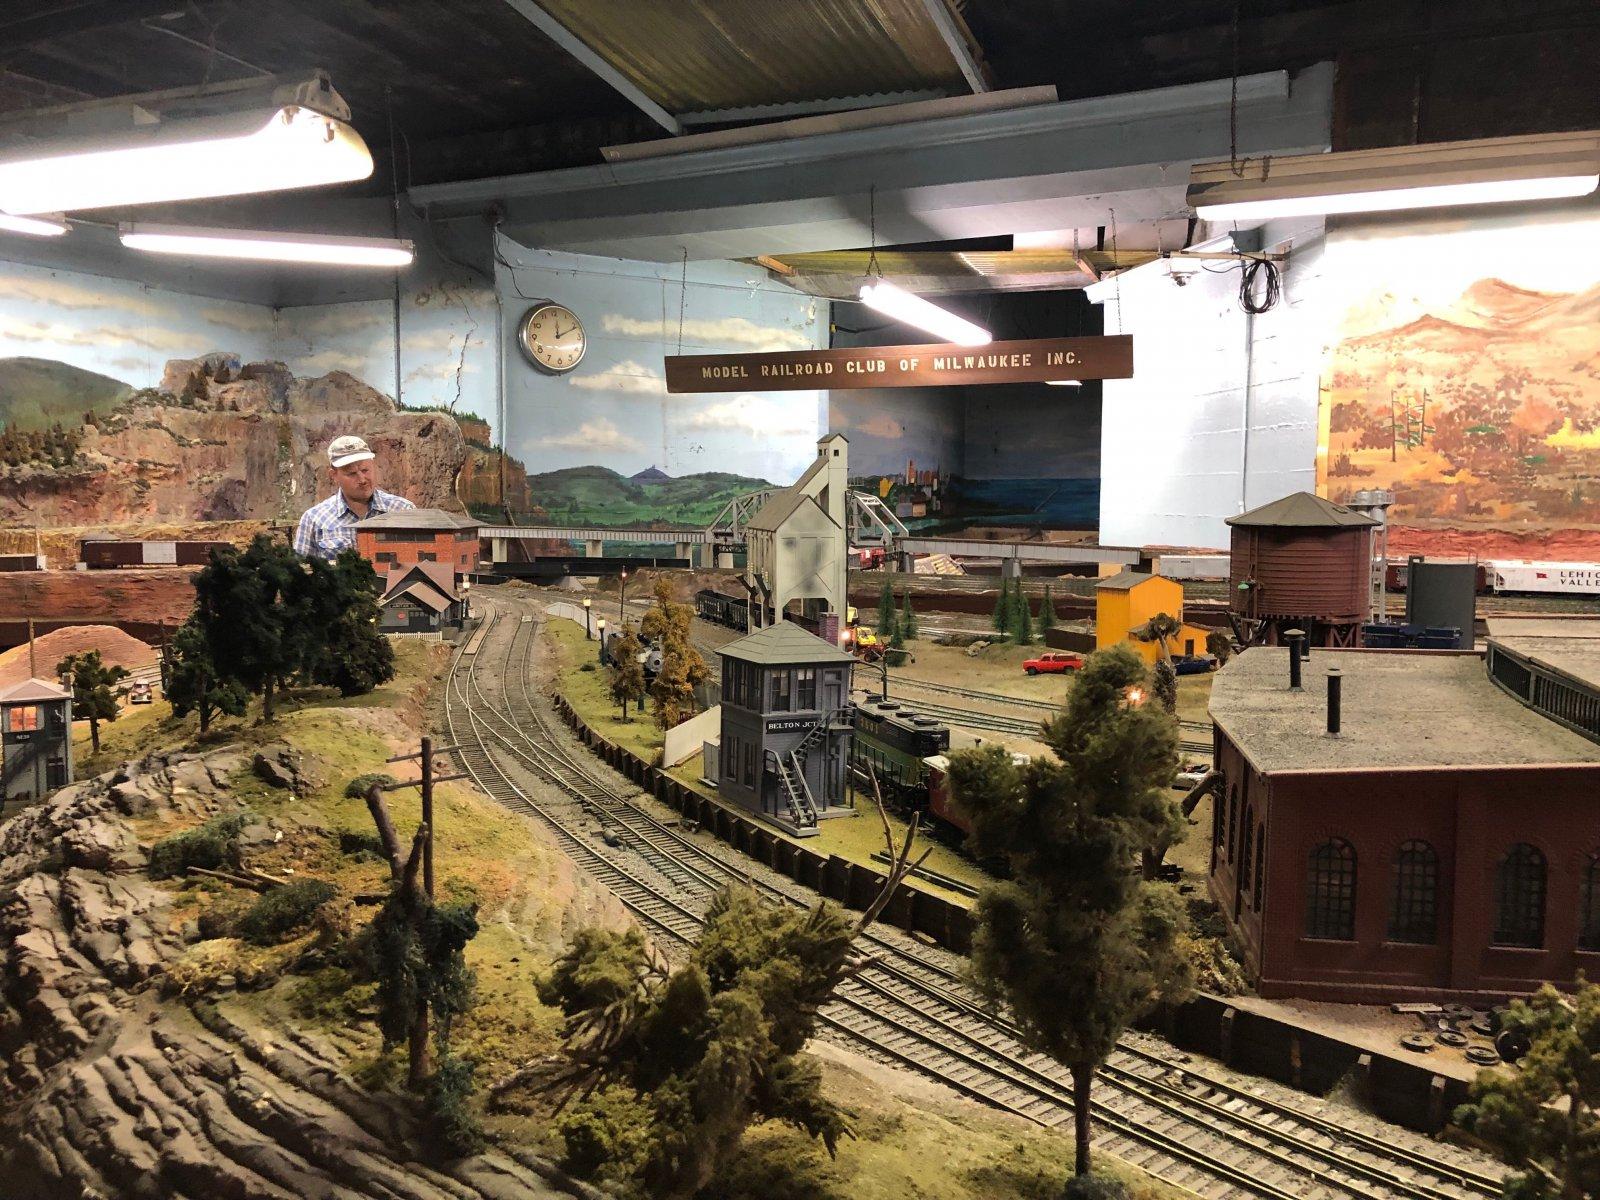 Model Railroad Club of Milwaukee